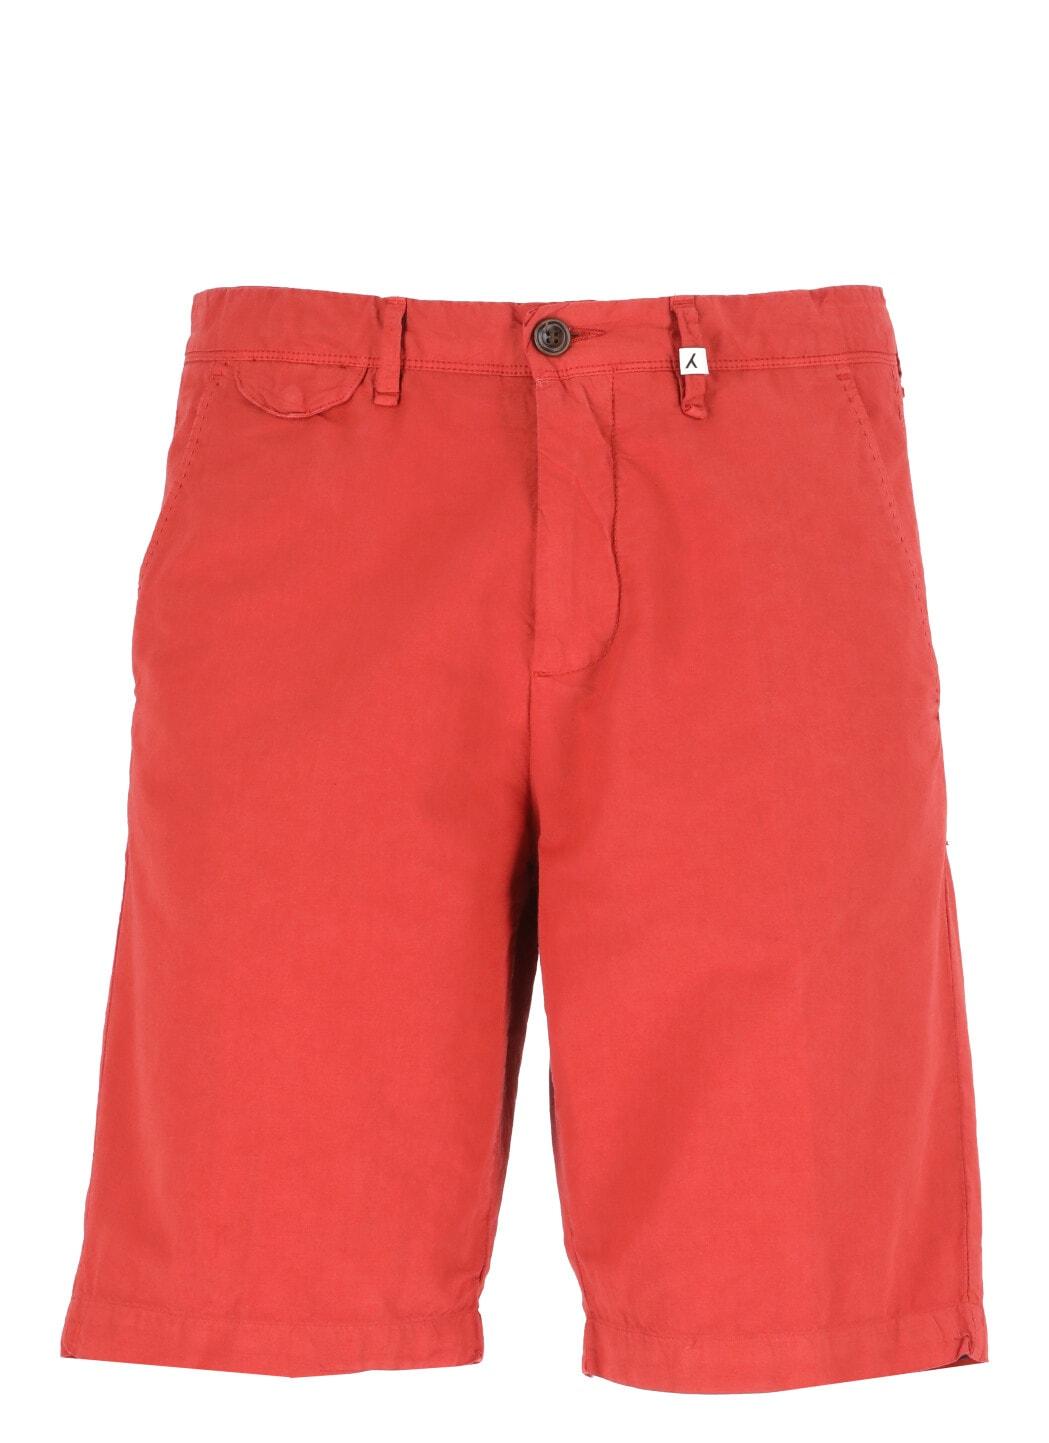 Cotton Blend Bermuda Short